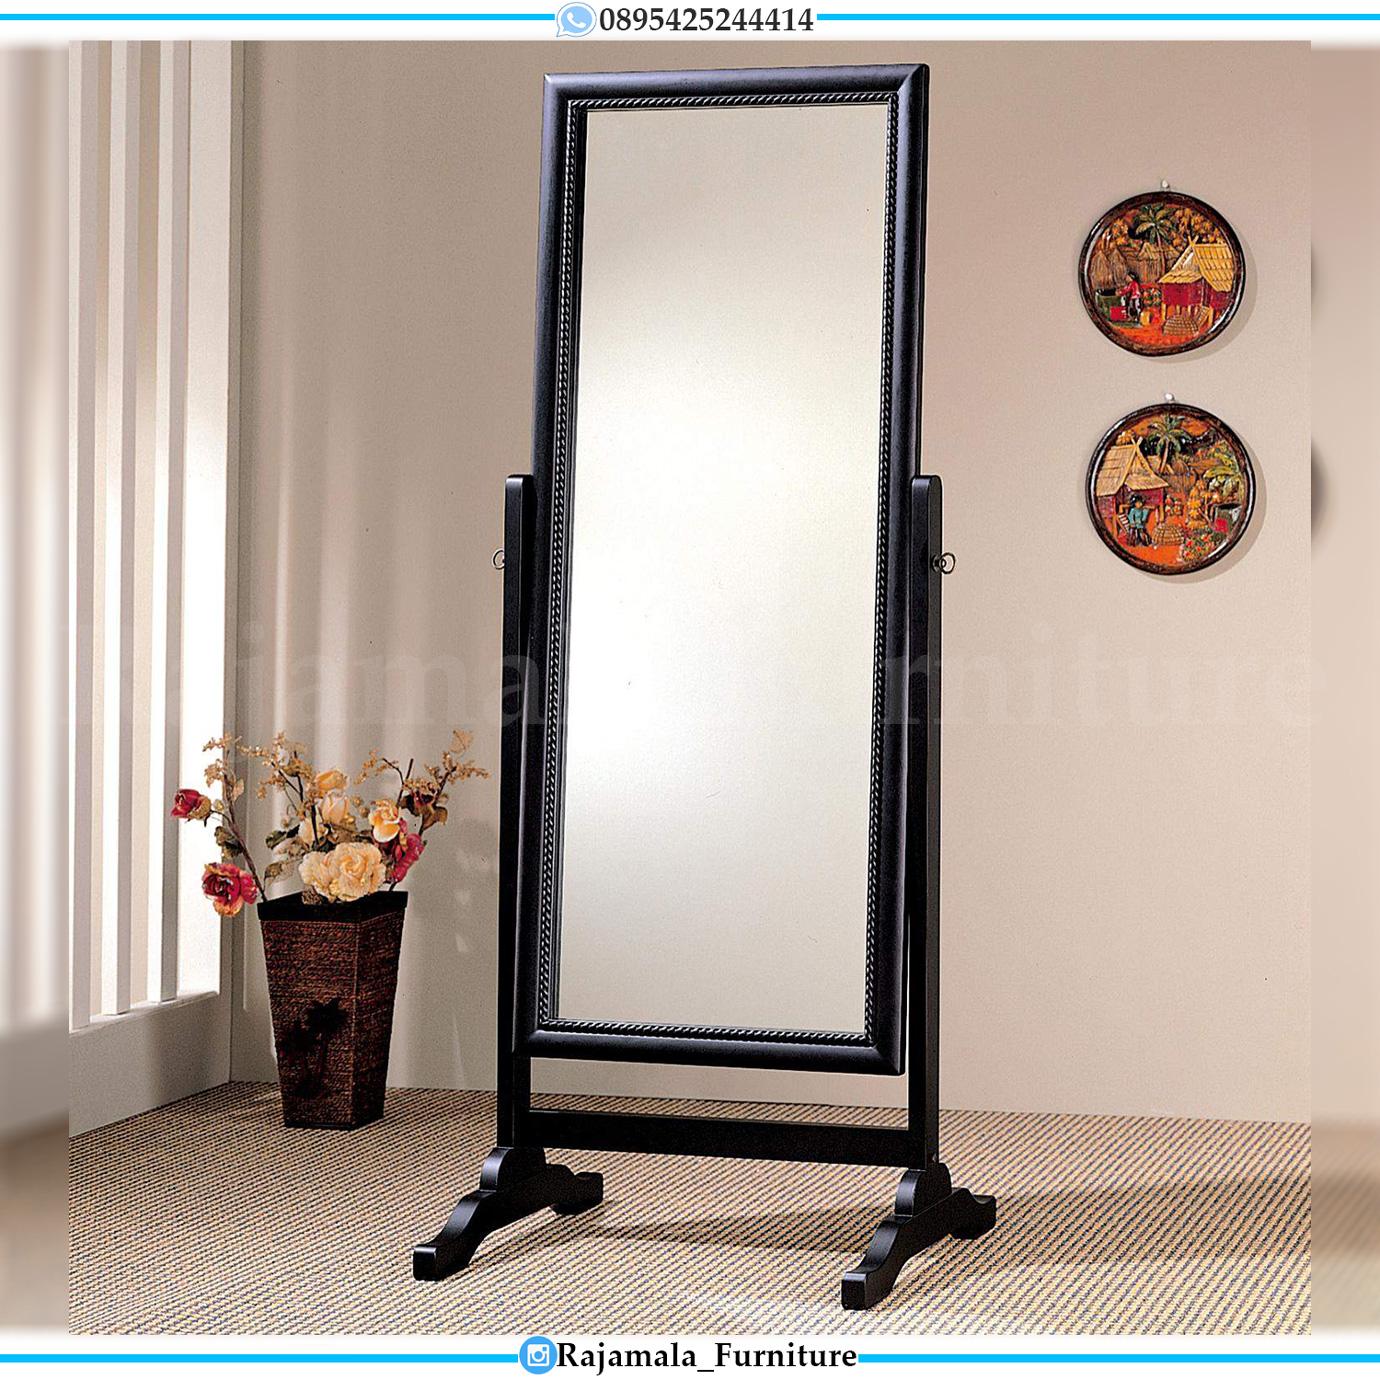 Stand Mirror Minimalis Black Duco Modern Design Cermin Terbaru RM-0051